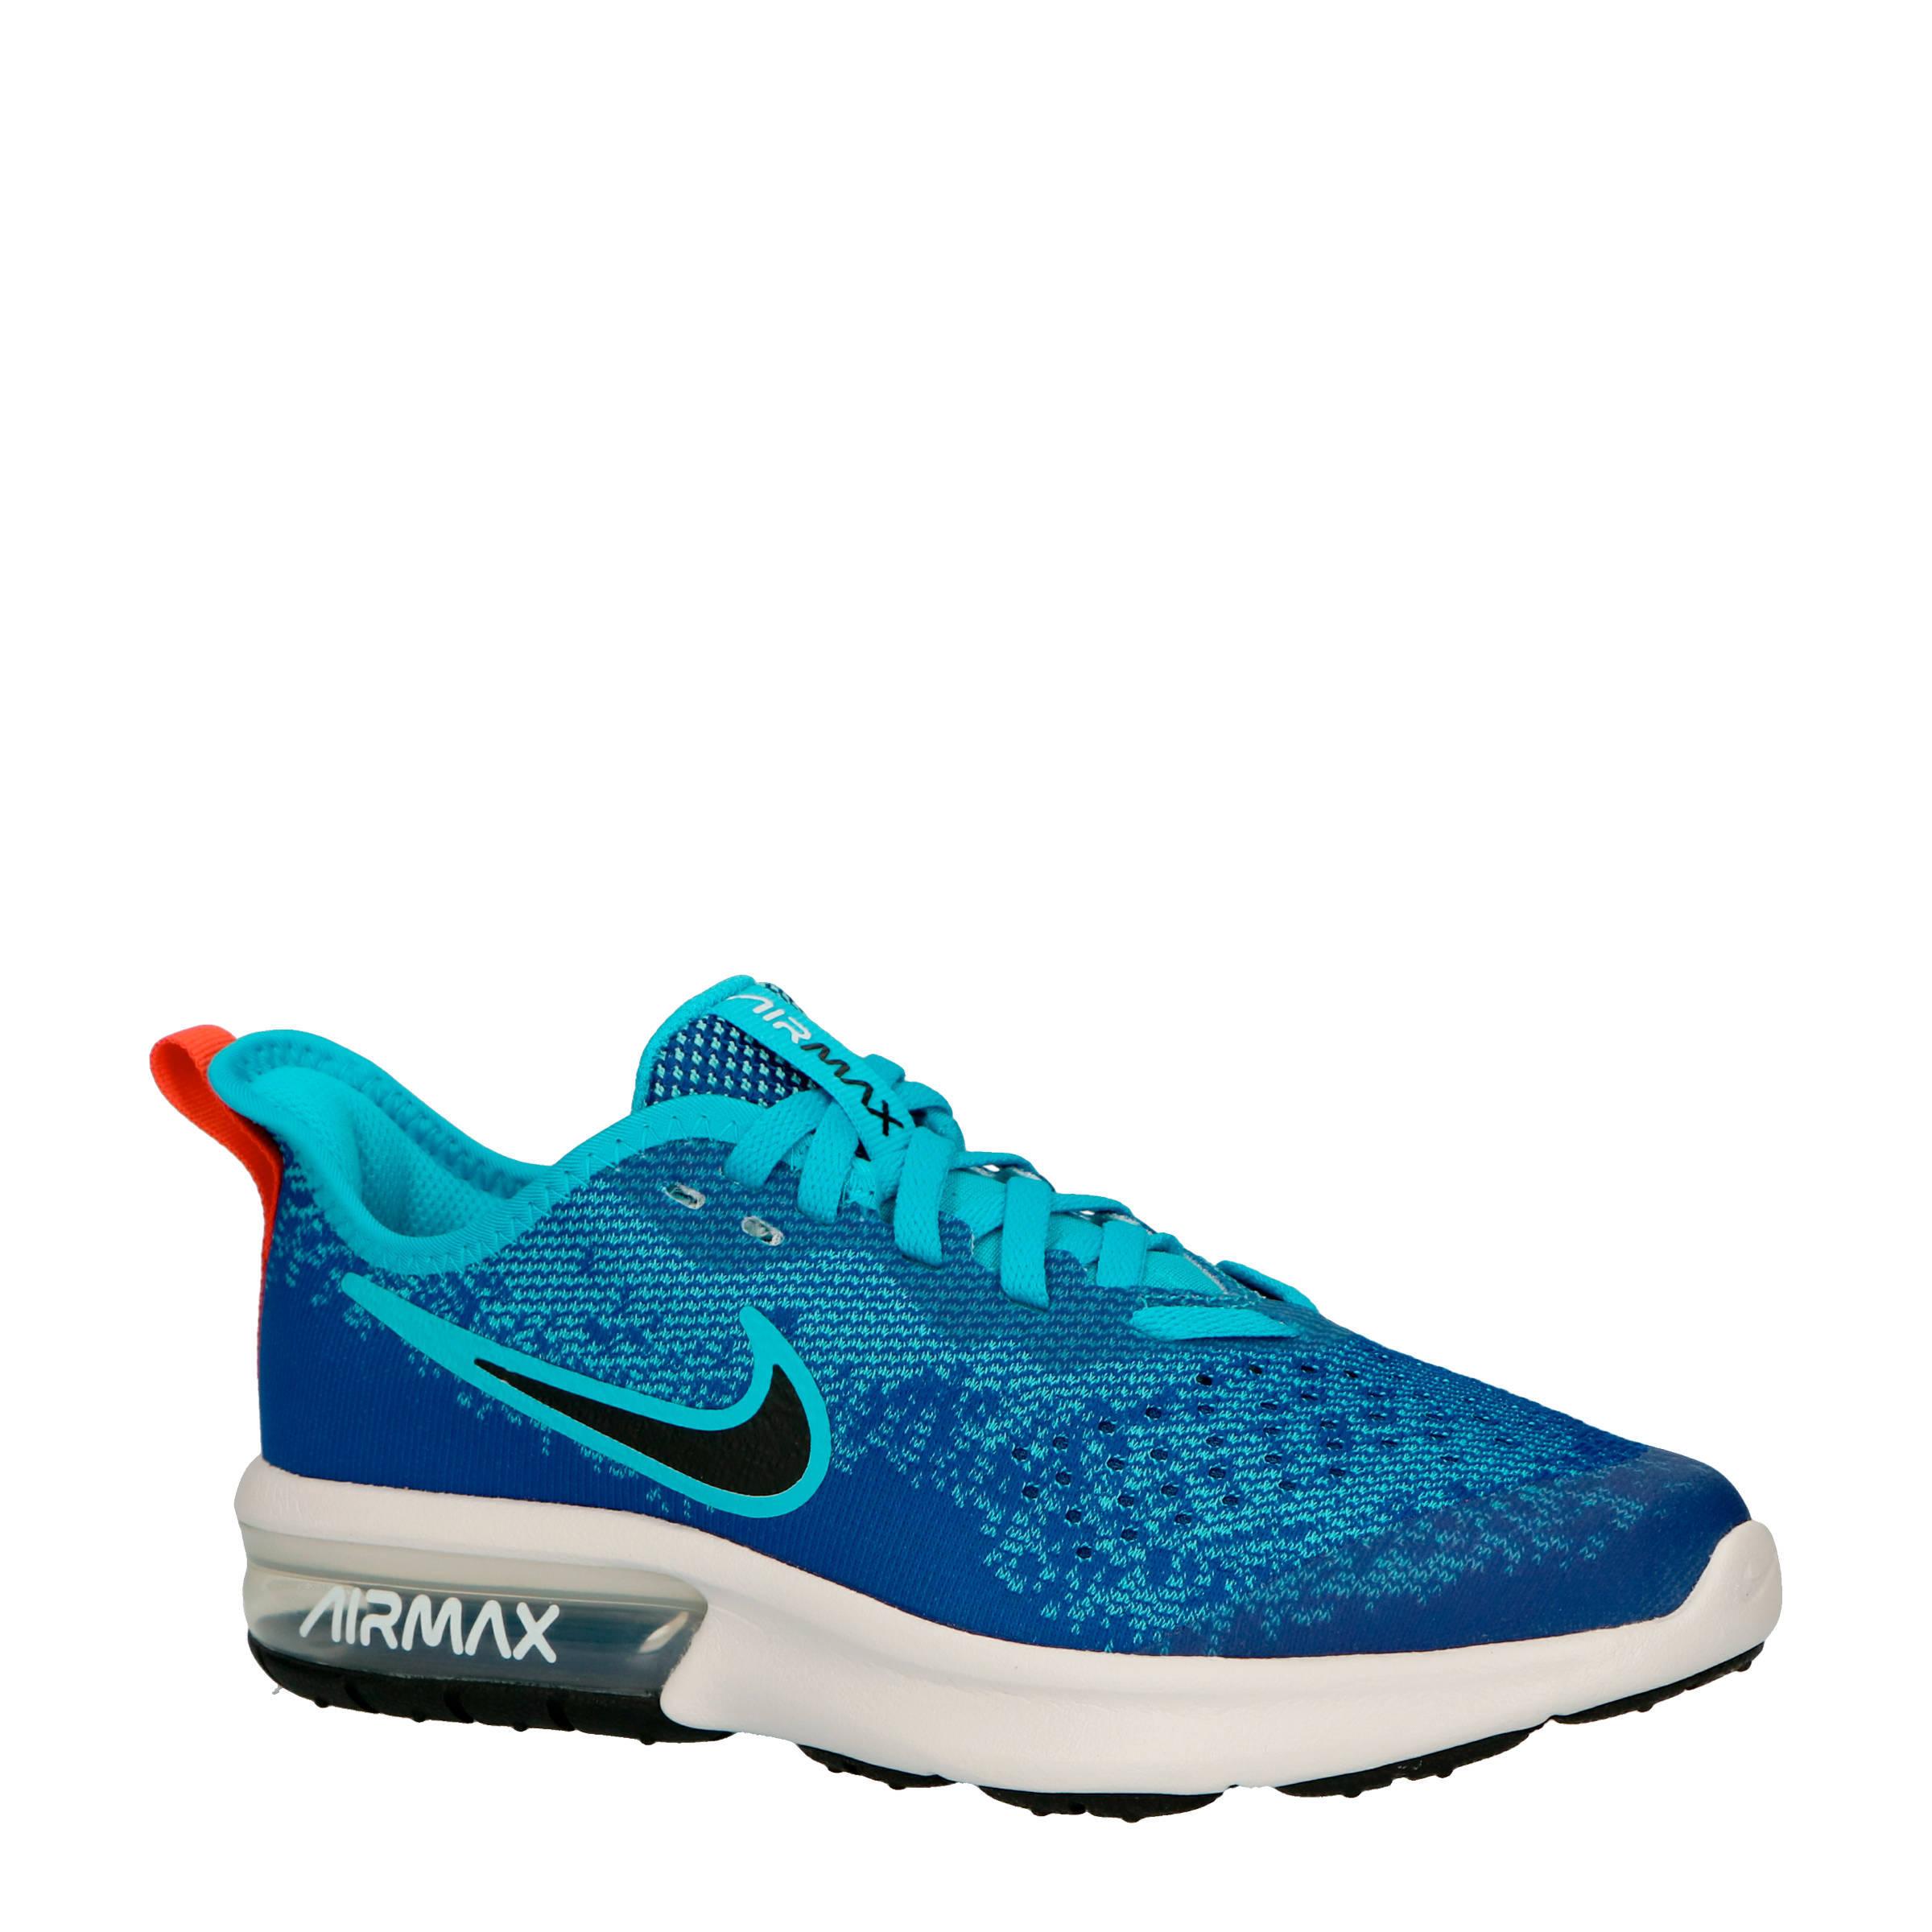 low priced 2f9ea 43b77 Nike kids bij wehkamp - Gratis bezorging vanaf 20.-